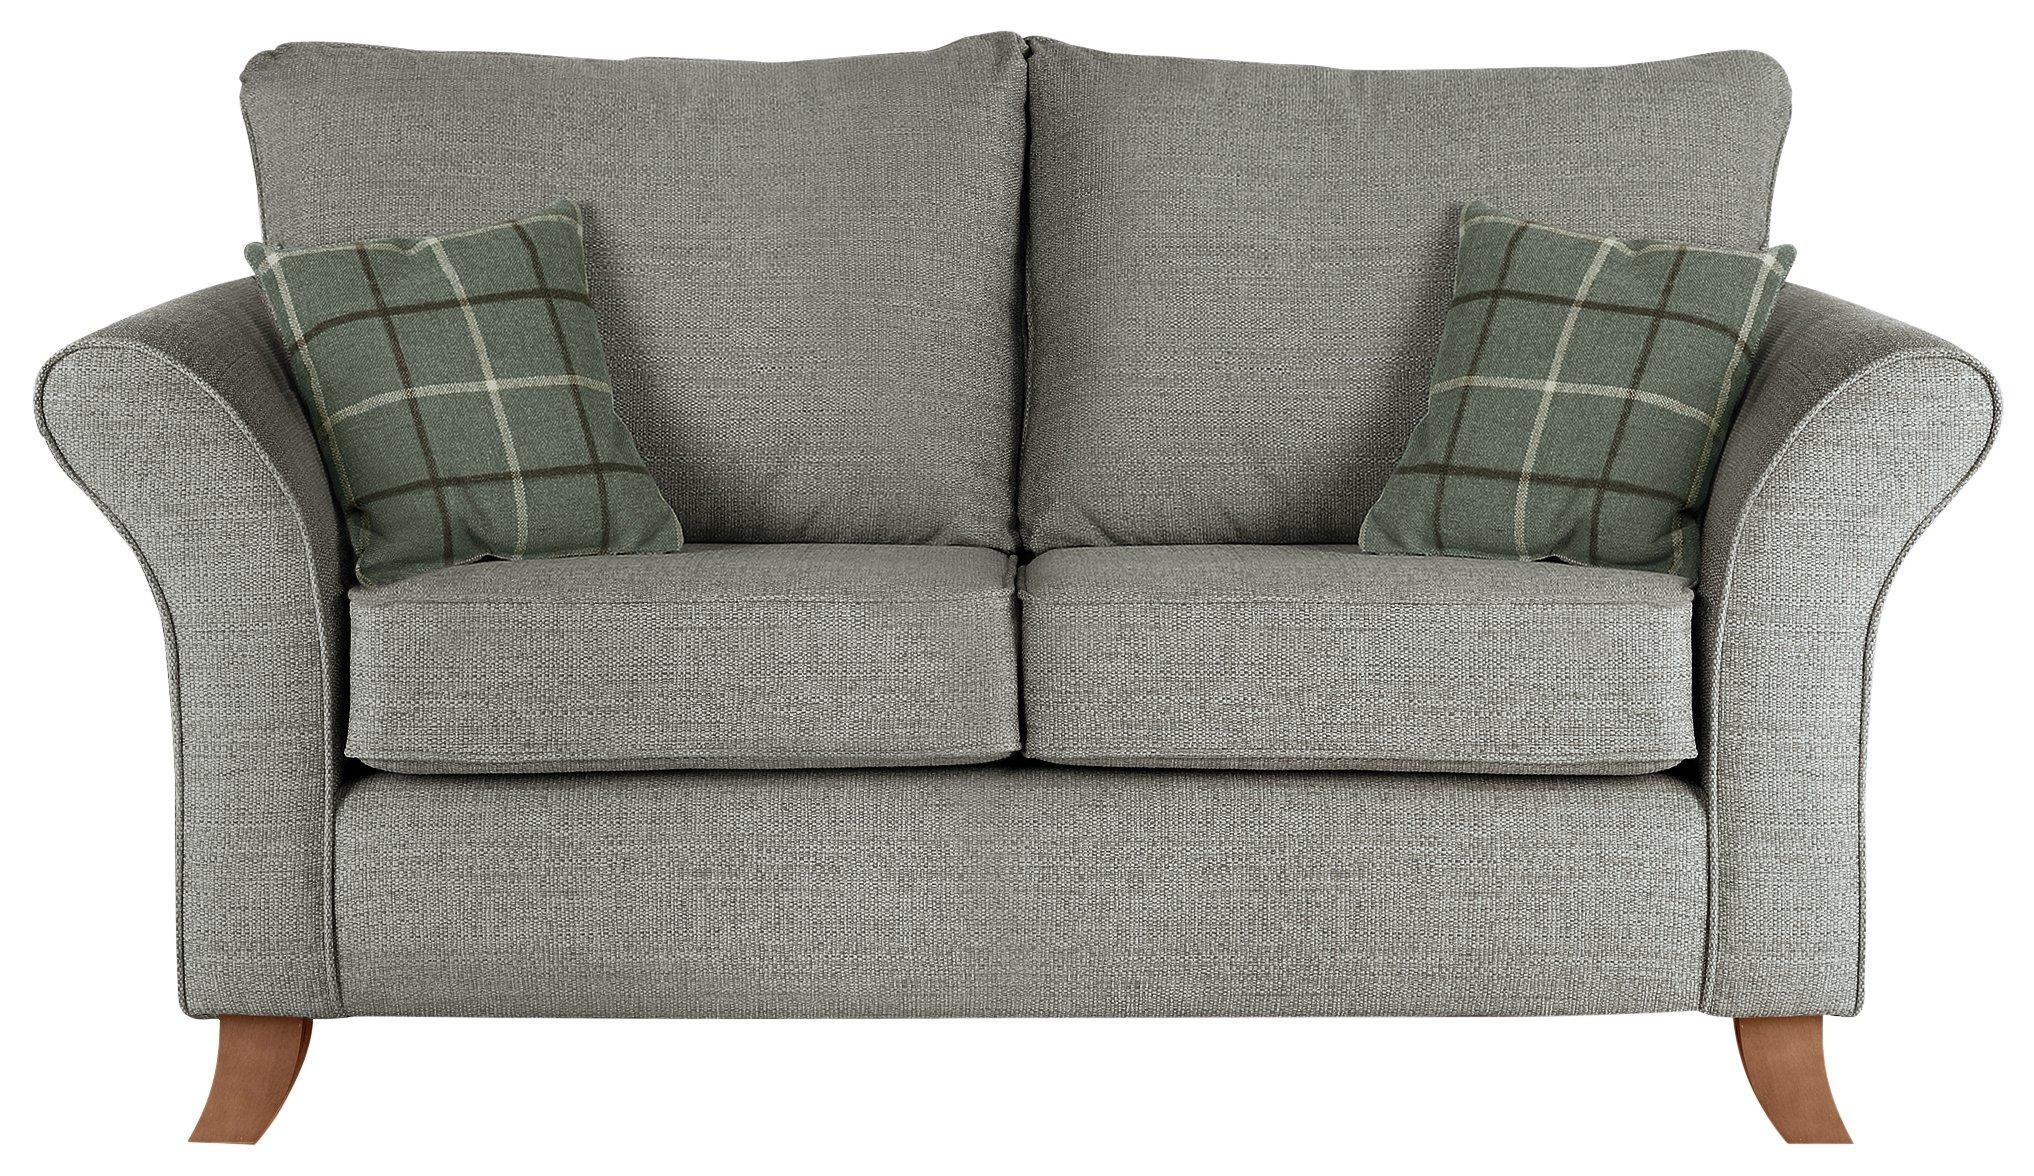 Fabulous Argos Home Kayla 2 Seater Fabric Sofa Light Grey 6148715 Bralicious Painted Fabric Chair Ideas Braliciousco